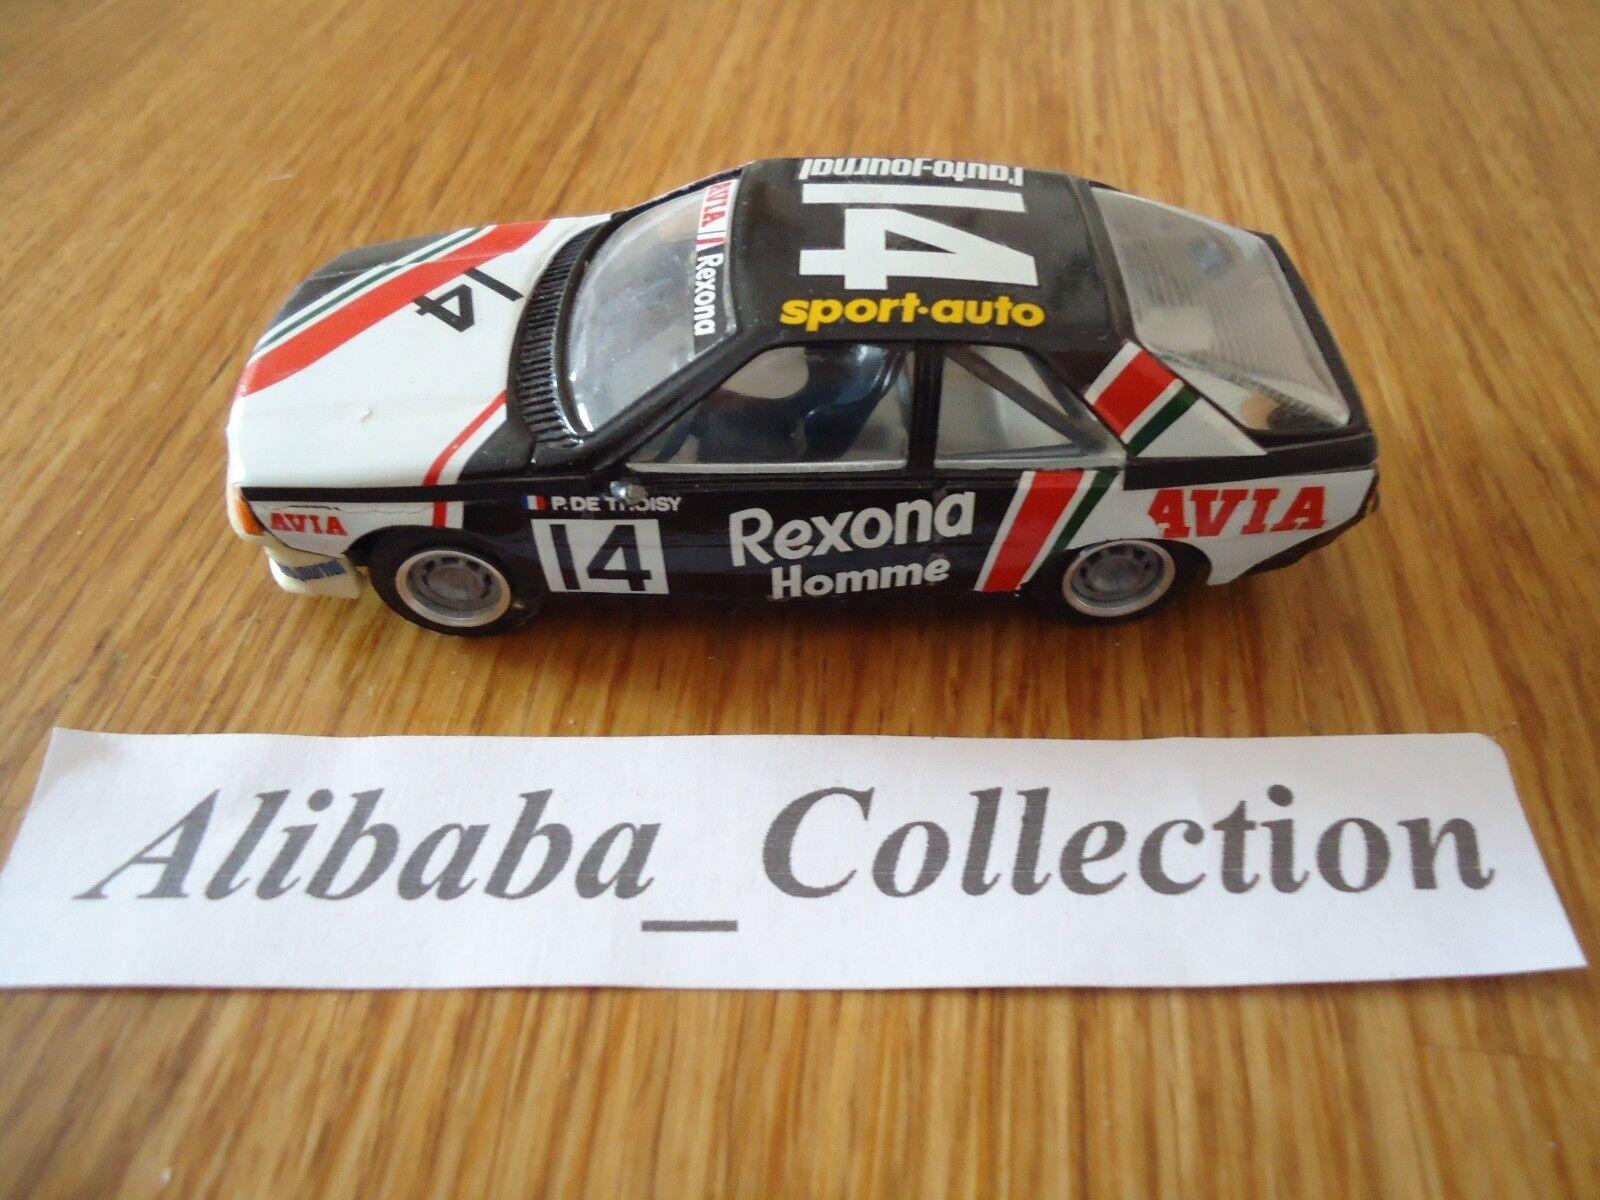 Renault Fuego 14 da Susan Top Rexona 1982 Rally Top 43